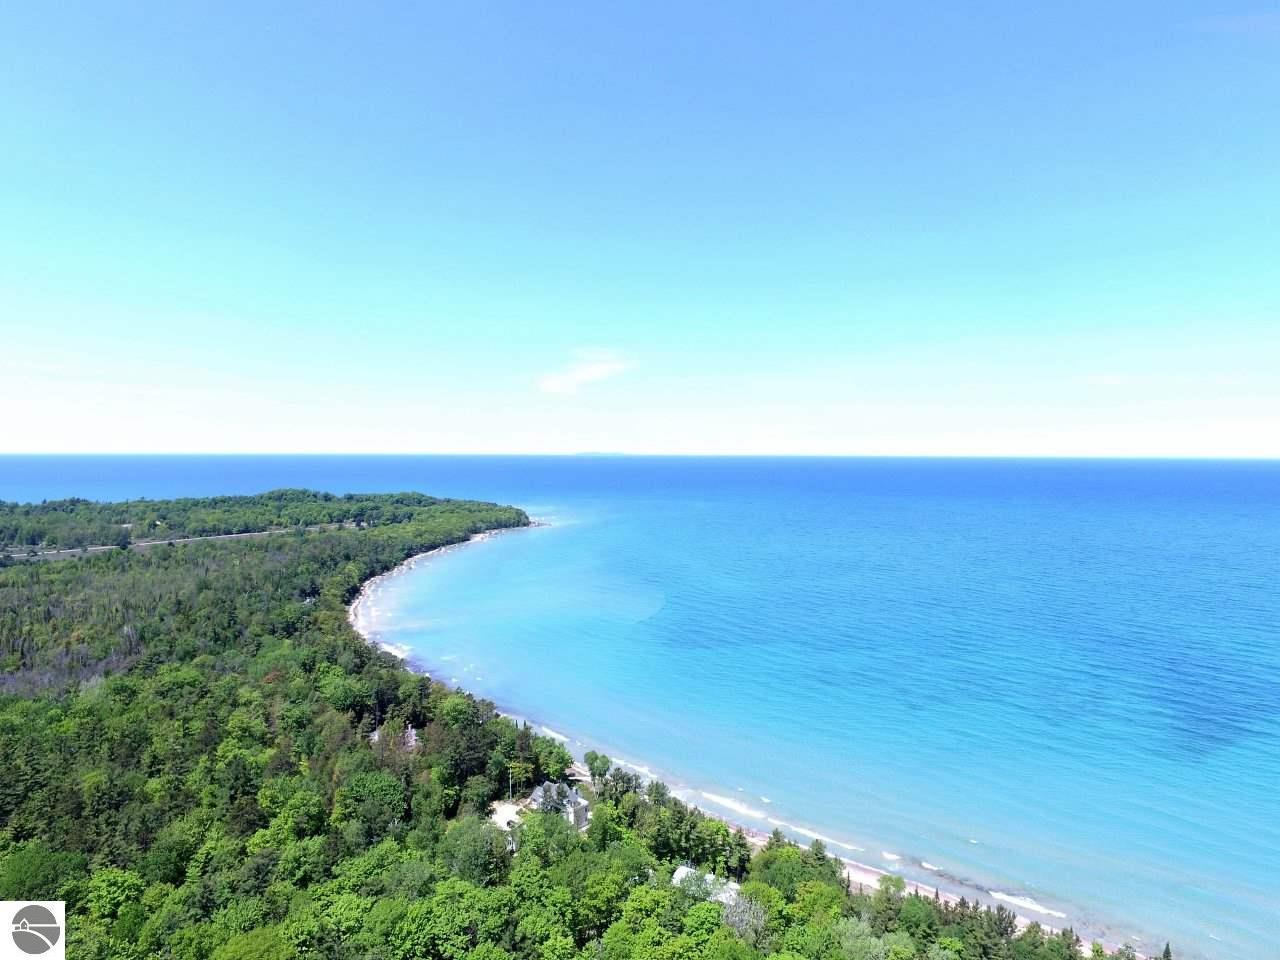 Michigan leelanau county northport 49670 - Property For Sale At E Kinnikinick Road Northport Mi 49670